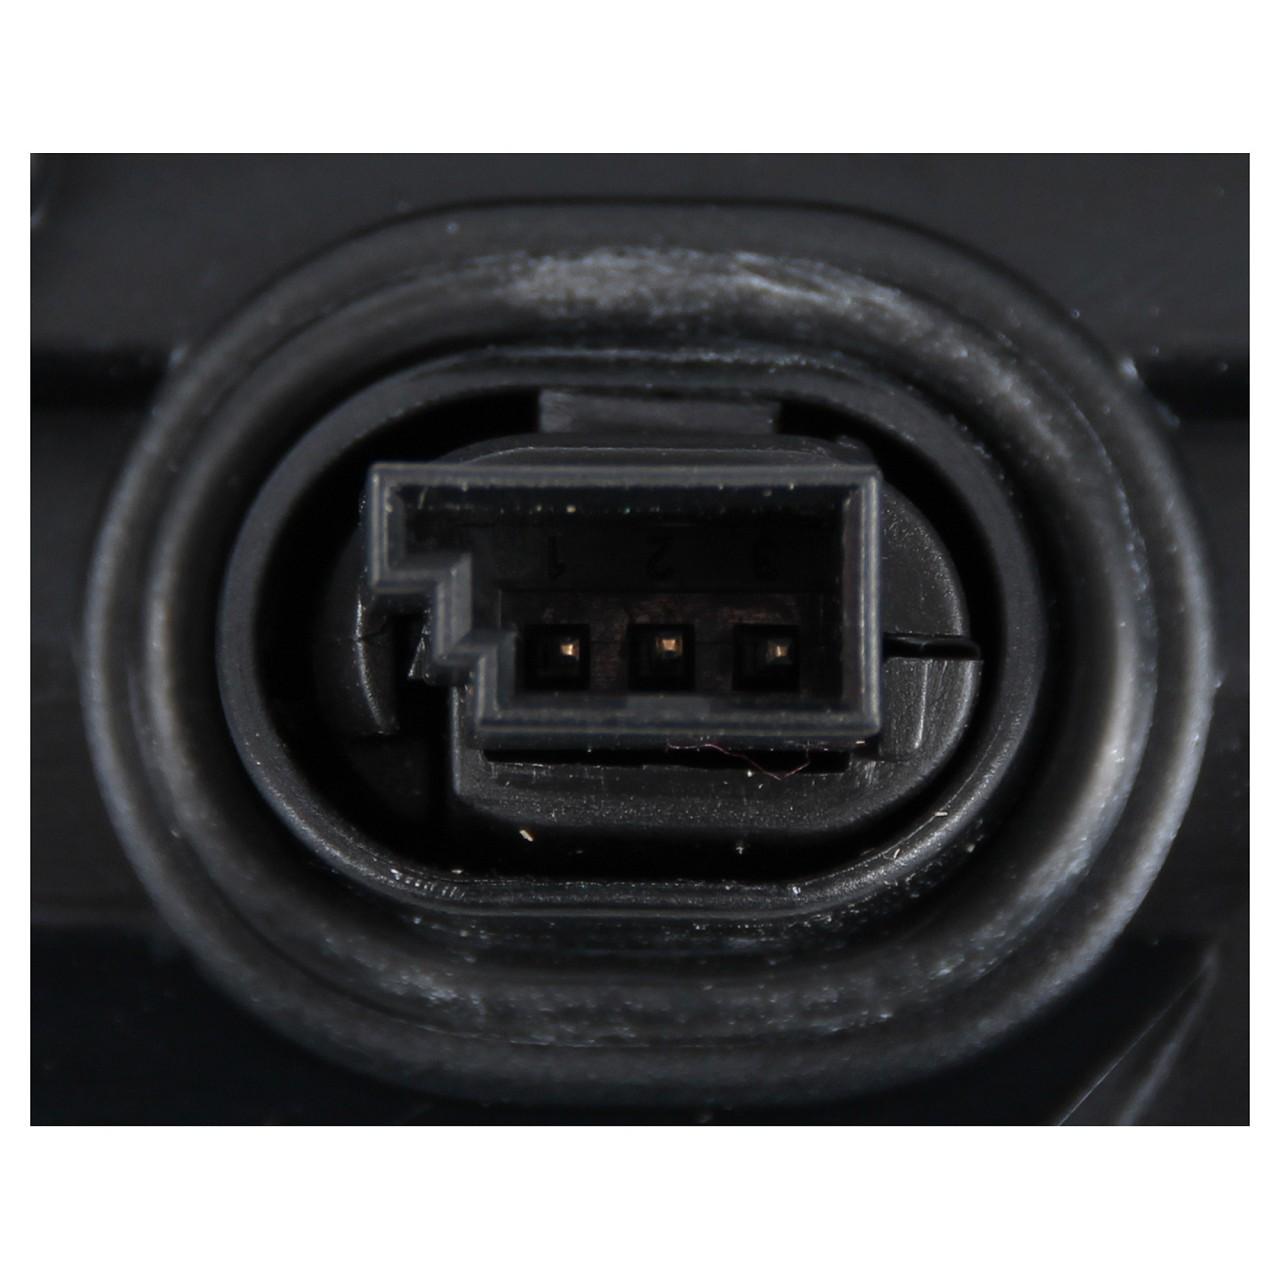 ORIGINAL Mini Heckklappengriff Griffleiste 51132753602 für R56 CABRIO R57 ONE